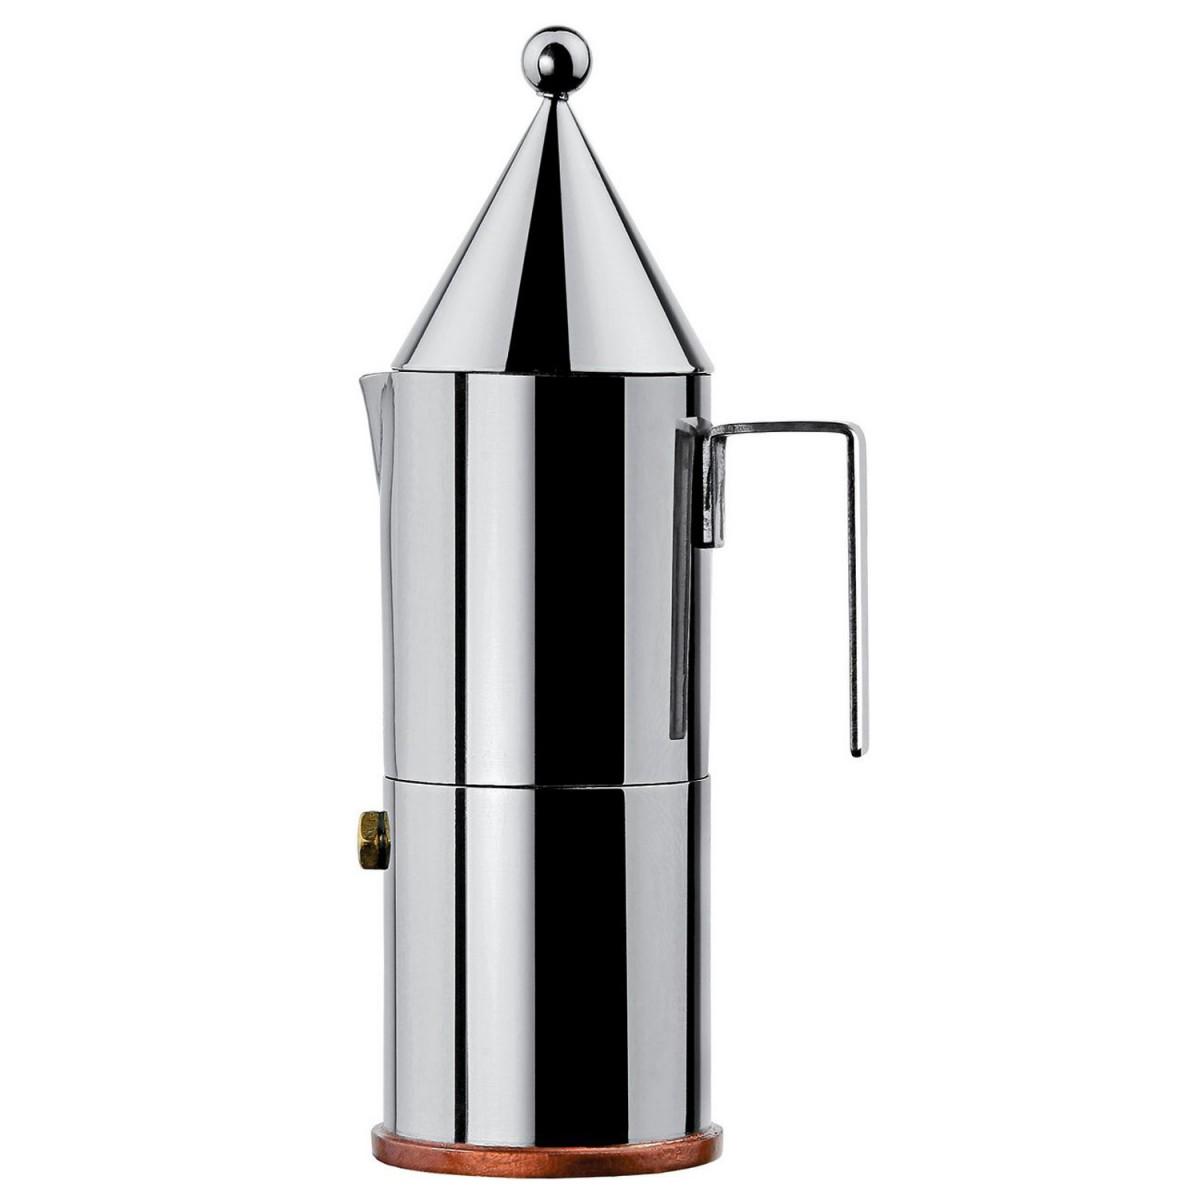 alessi espressomaschine la conica 30 cl 90002 6 k che kochen kaffee tee espressokocher. Black Bedroom Furniture Sets. Home Design Ideas